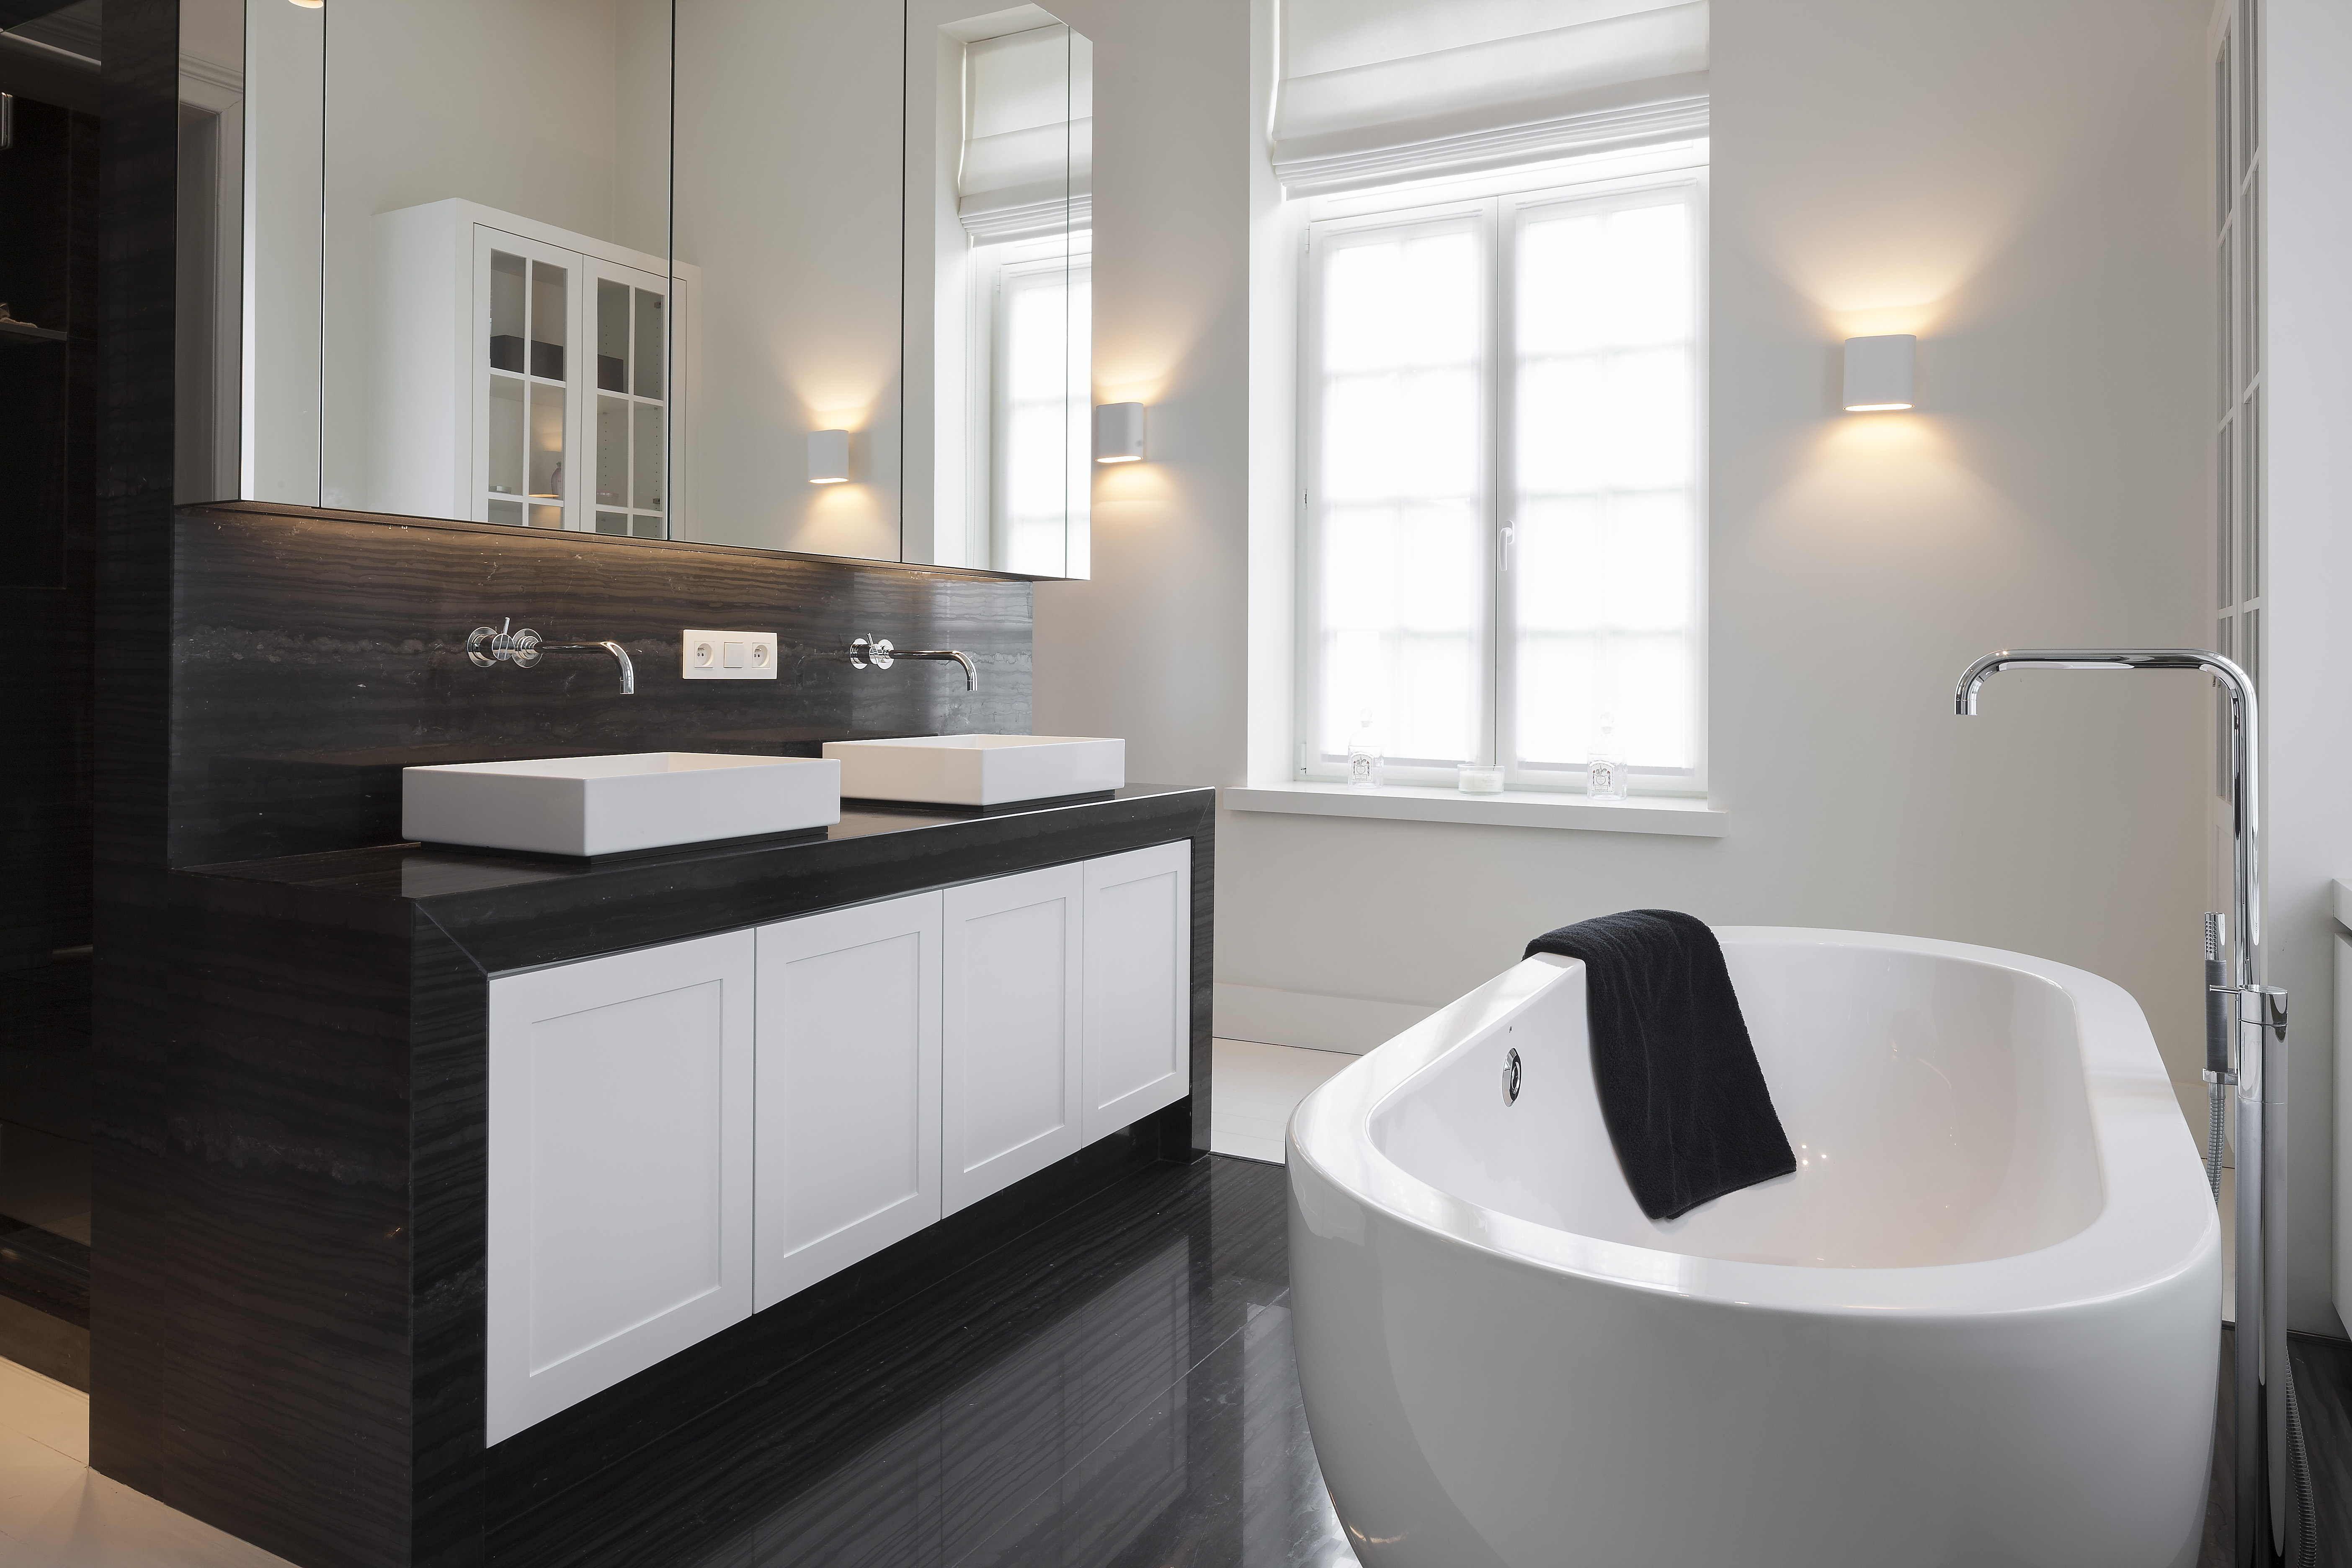 bathroom - by VADES interior design - for b+ villas | Modern Farm ...